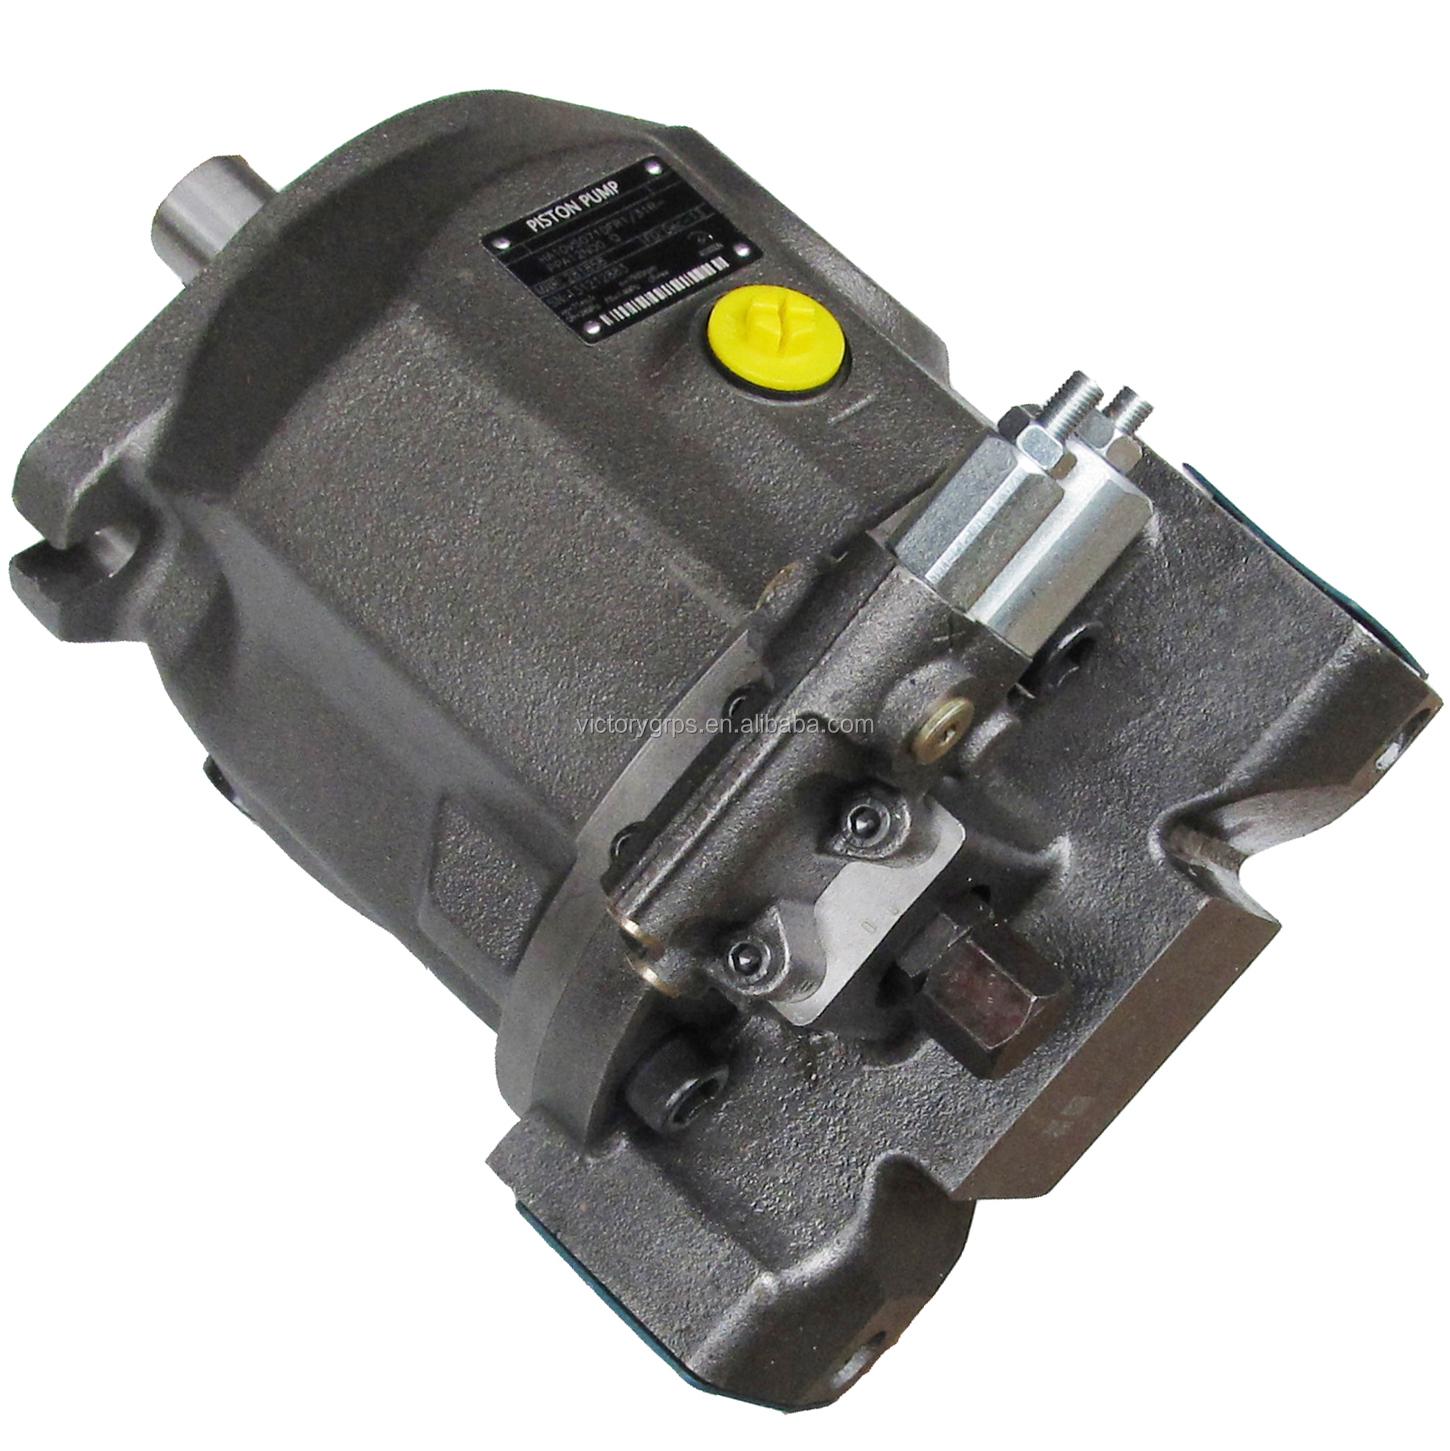 Axial Piston Brueninghaus Hydromatik Rexroth 52W A10VEC A10VEC45 and 23 28 37 45 58 63 A10FE A10FM A10VE Motor